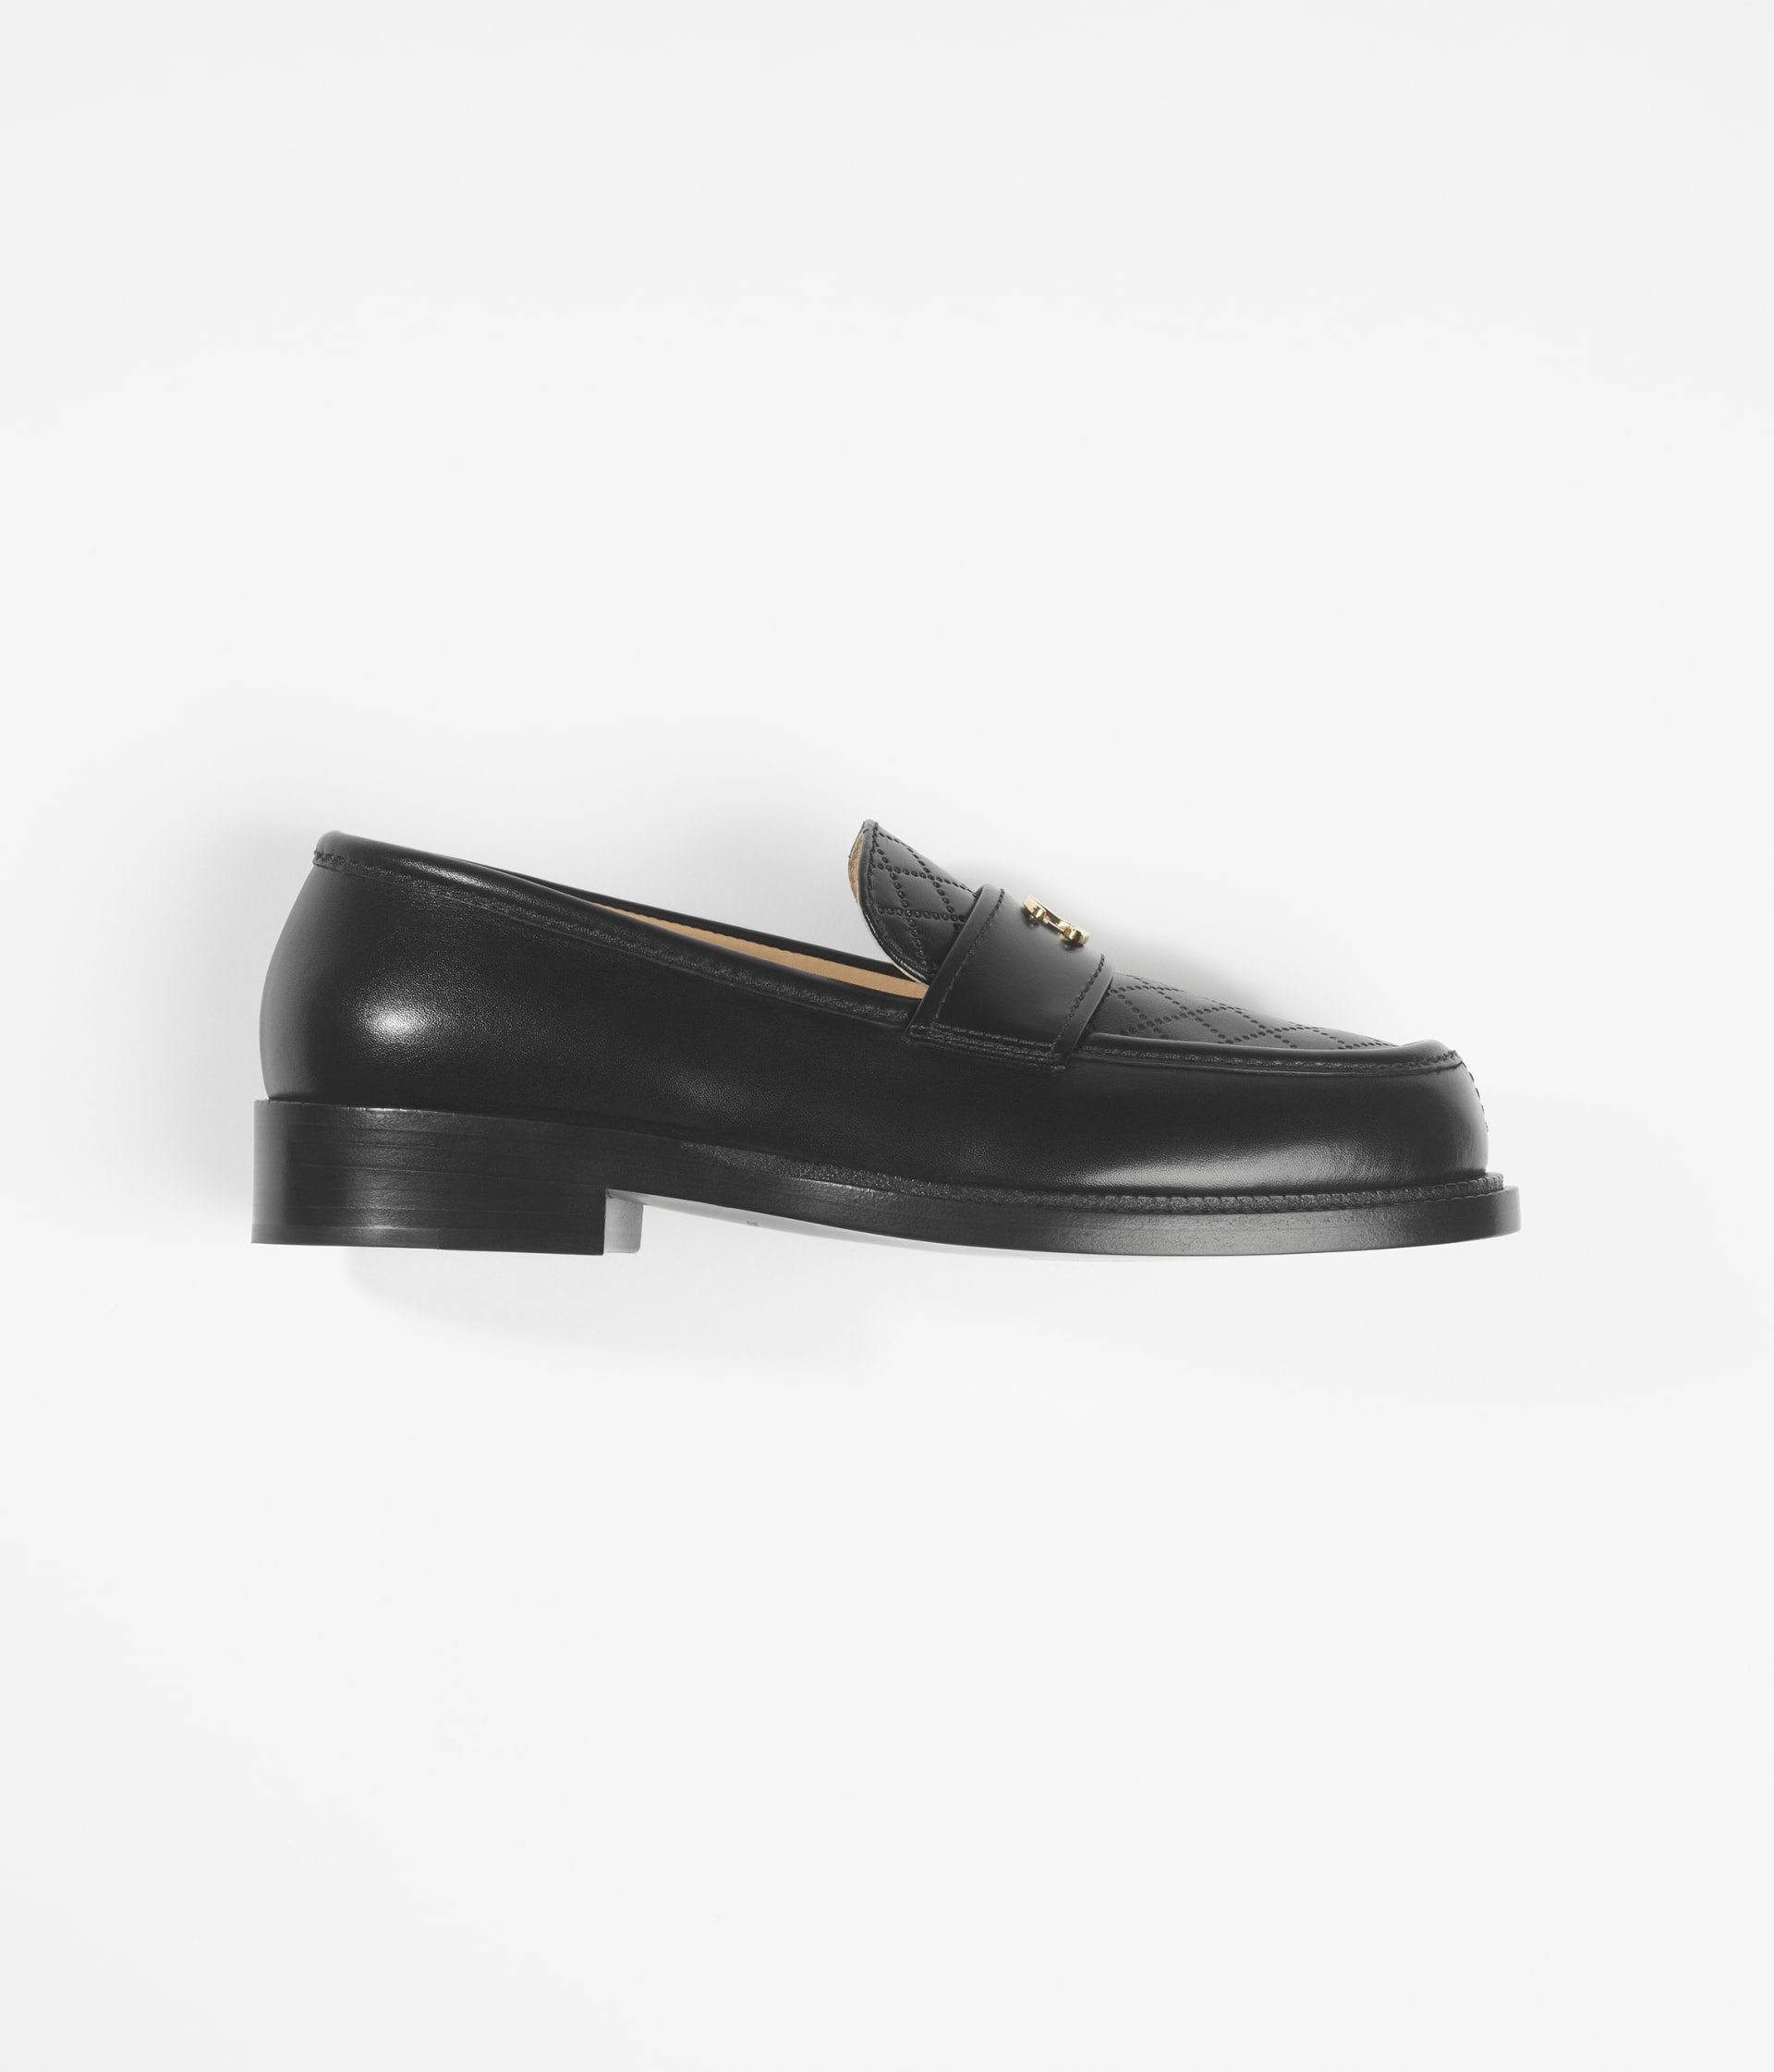 image 1 - Loafers - Shiny Calfskin - Black